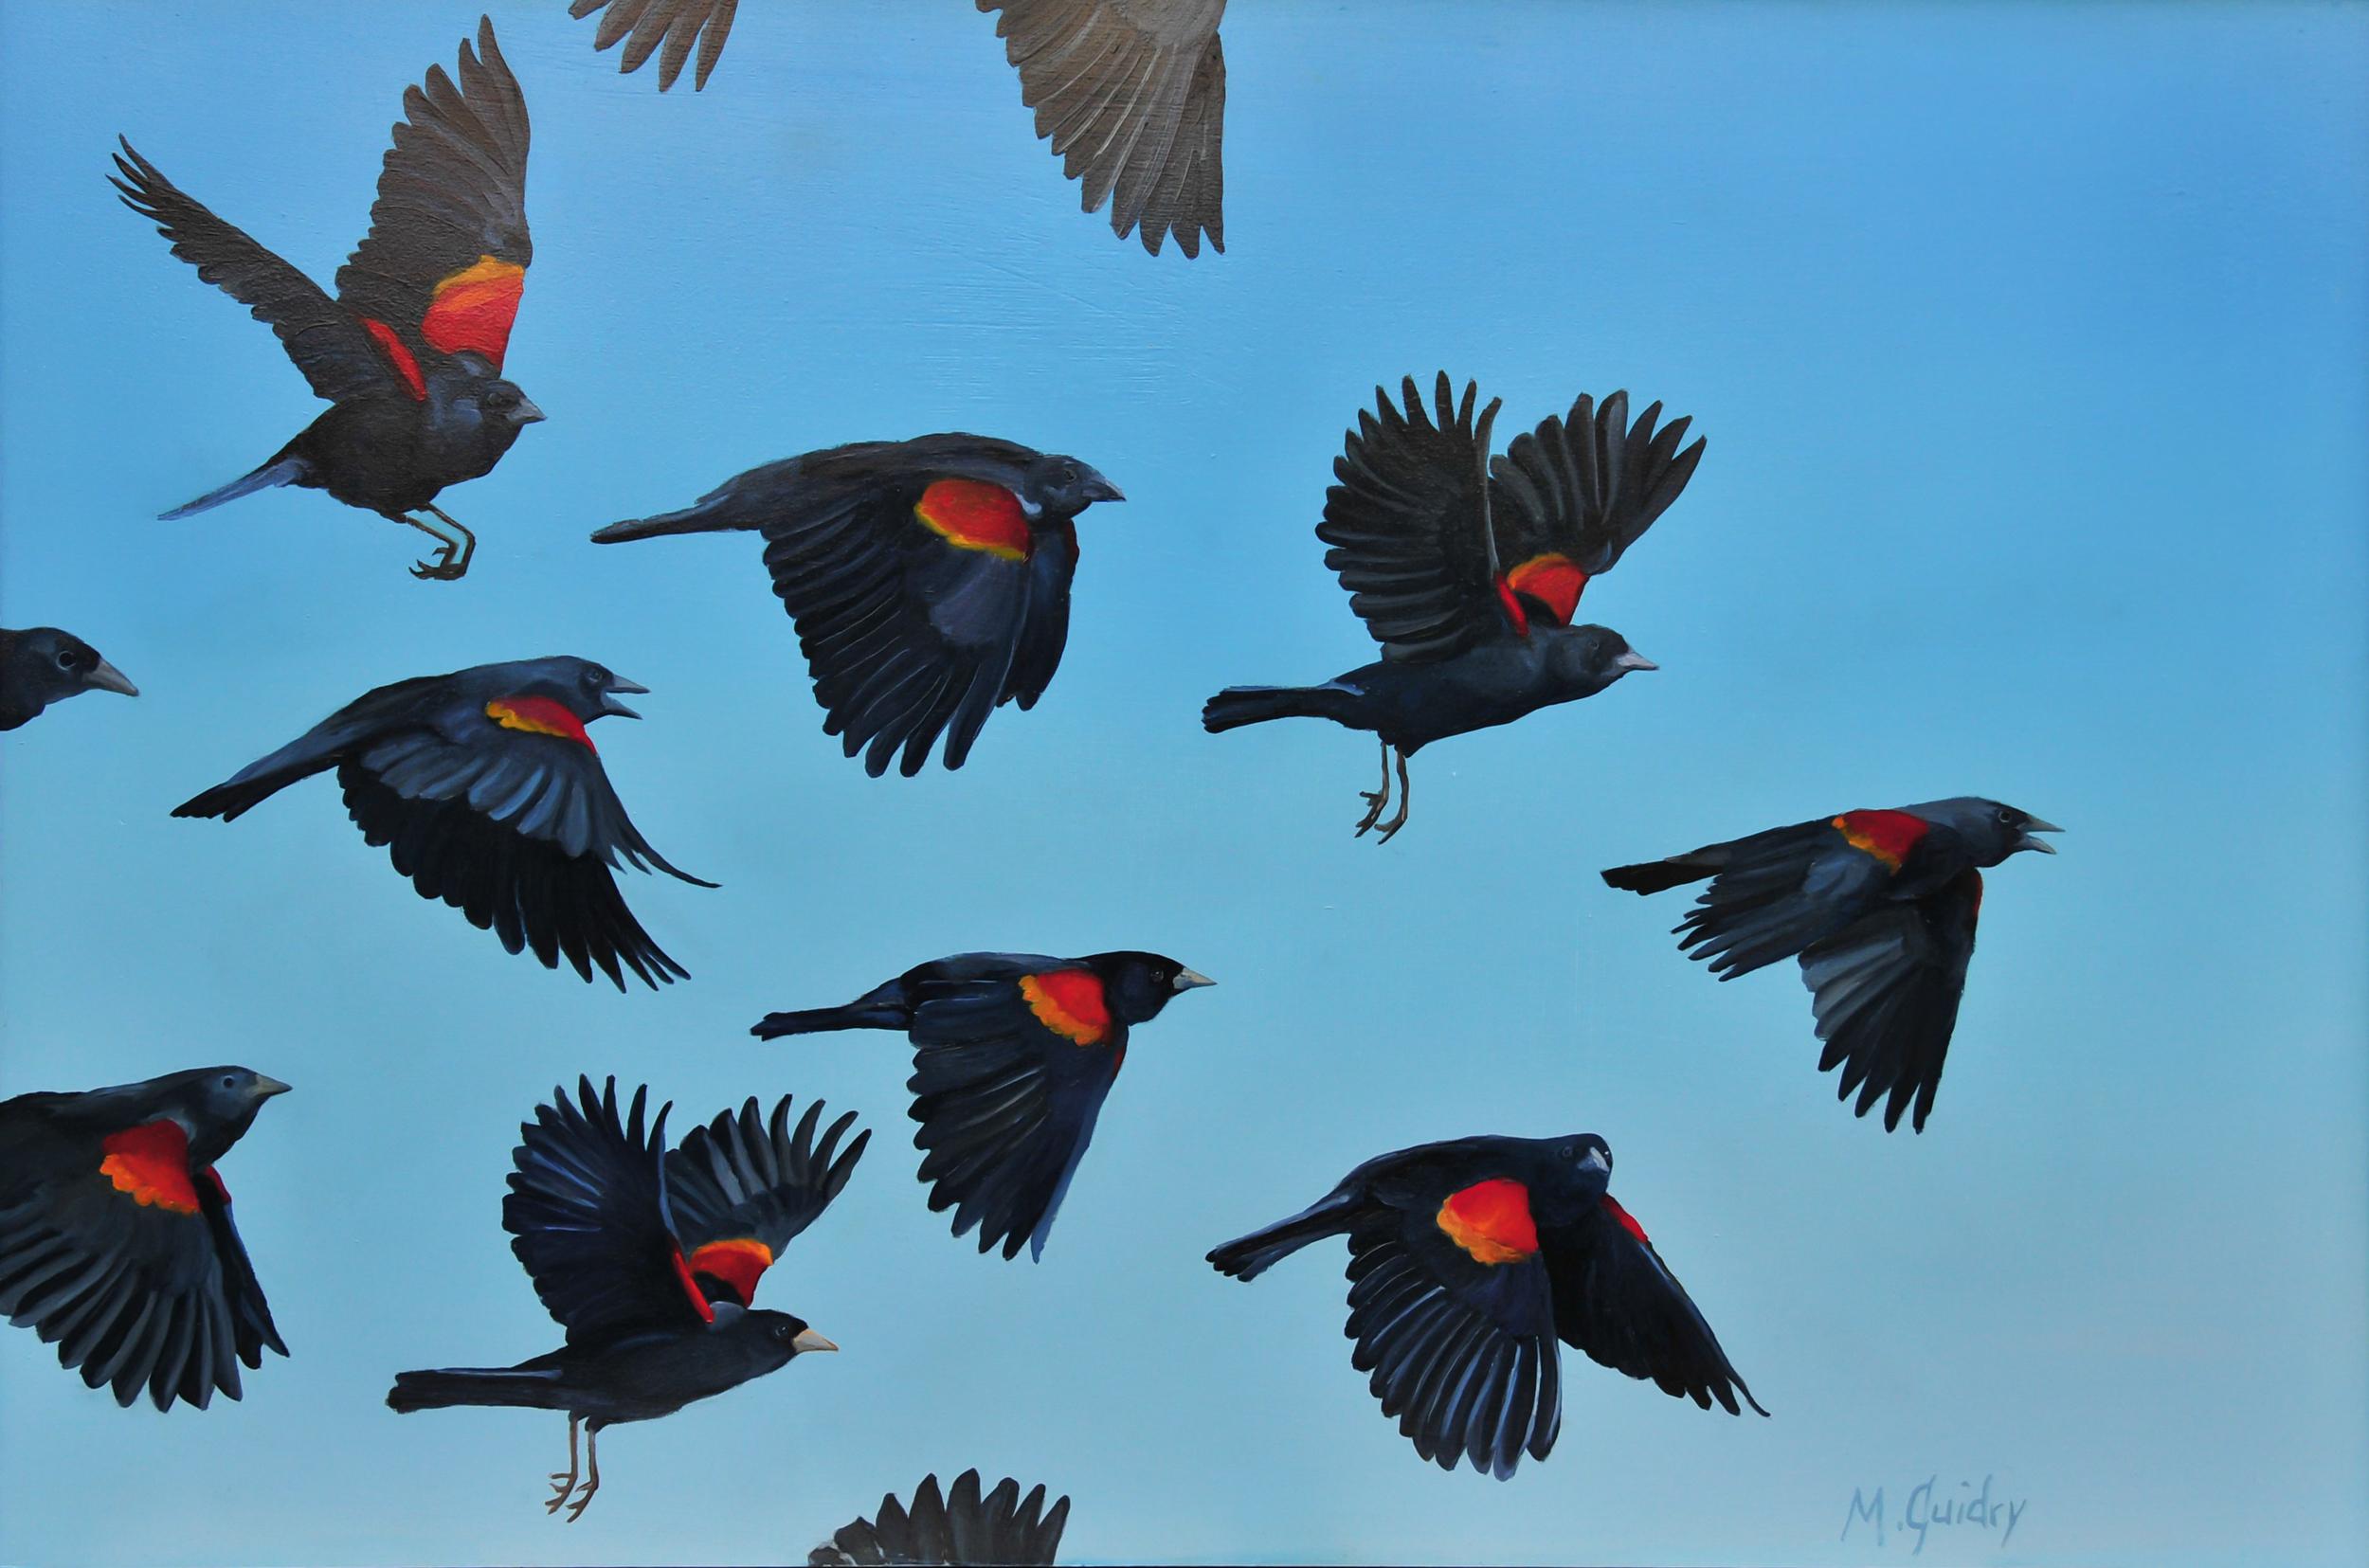 red_wing_blackbird_flock_louisiana_m.guidry_michael_guidry_oil_painting_marsh_new_orleans_artist.jpg.jpg